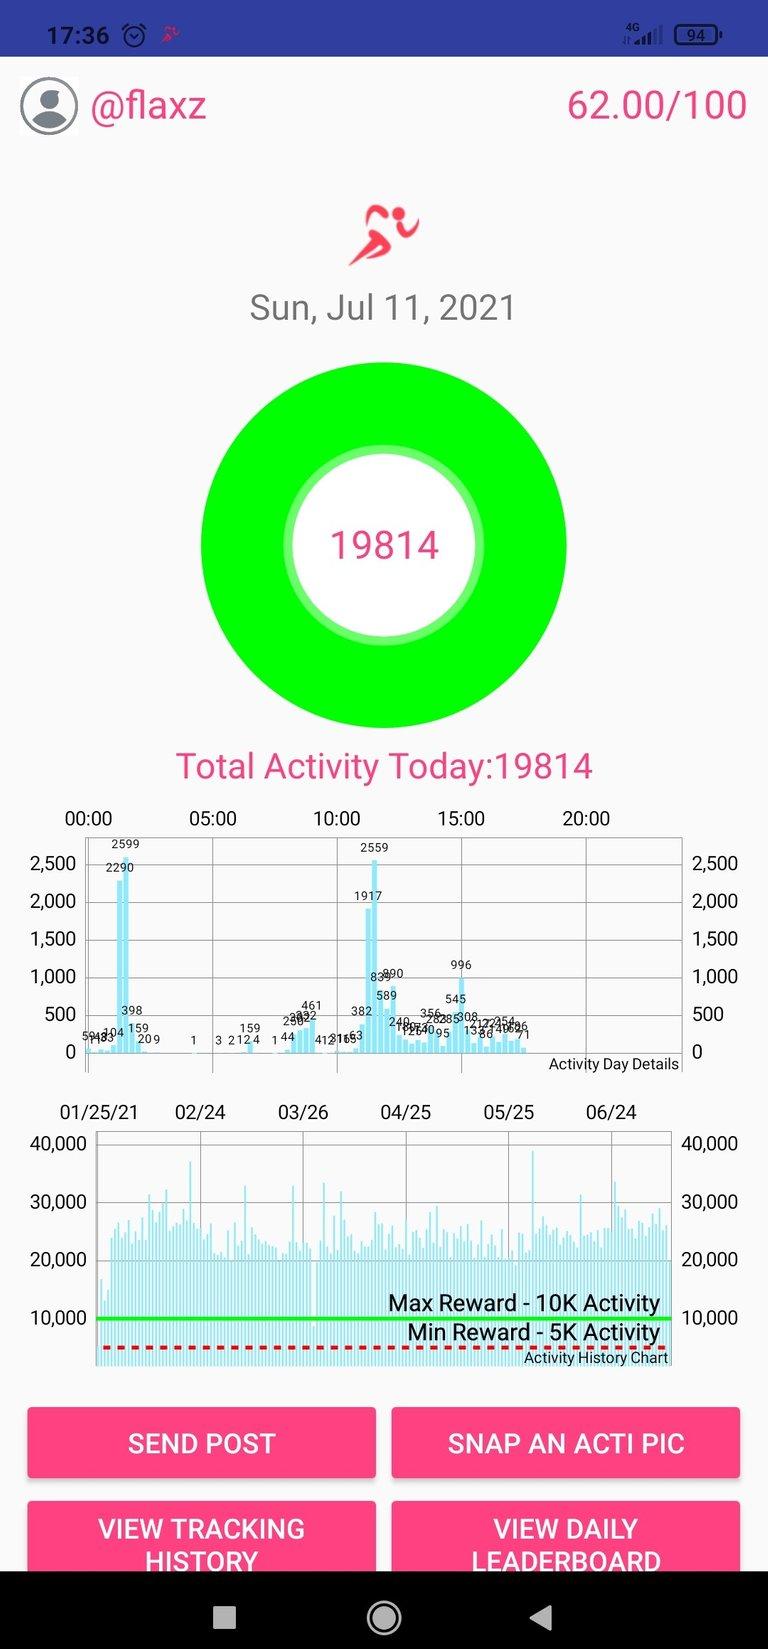 Screenshot_2021-07-11-17-36-15-614_io.actifit.fitnesstracker.actifitfitnesstracker.jpg